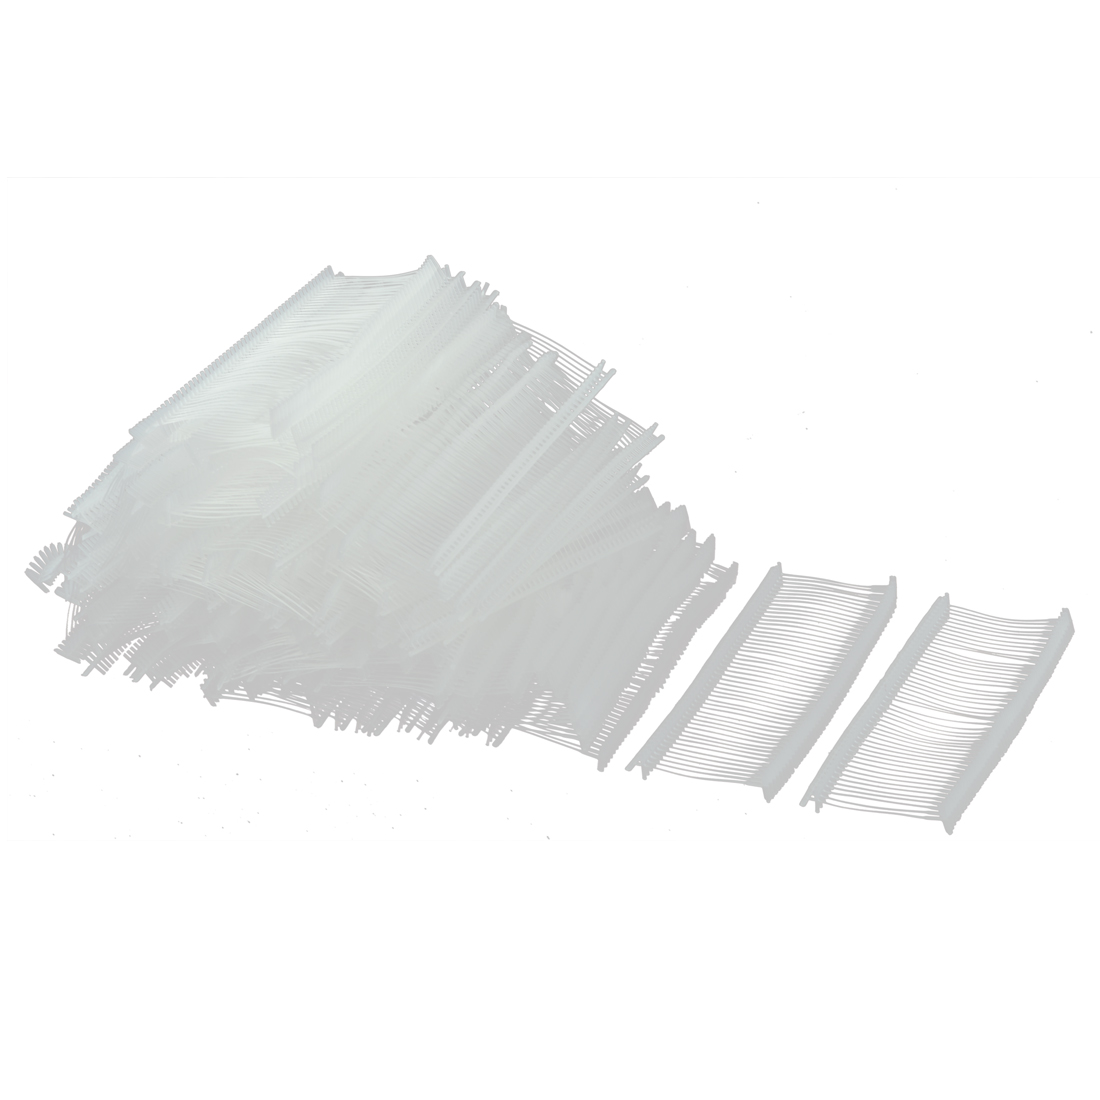 Plastic Snap Lock Security Loop Tag Fastener White 35mm Inner Dia 5000 Pcs